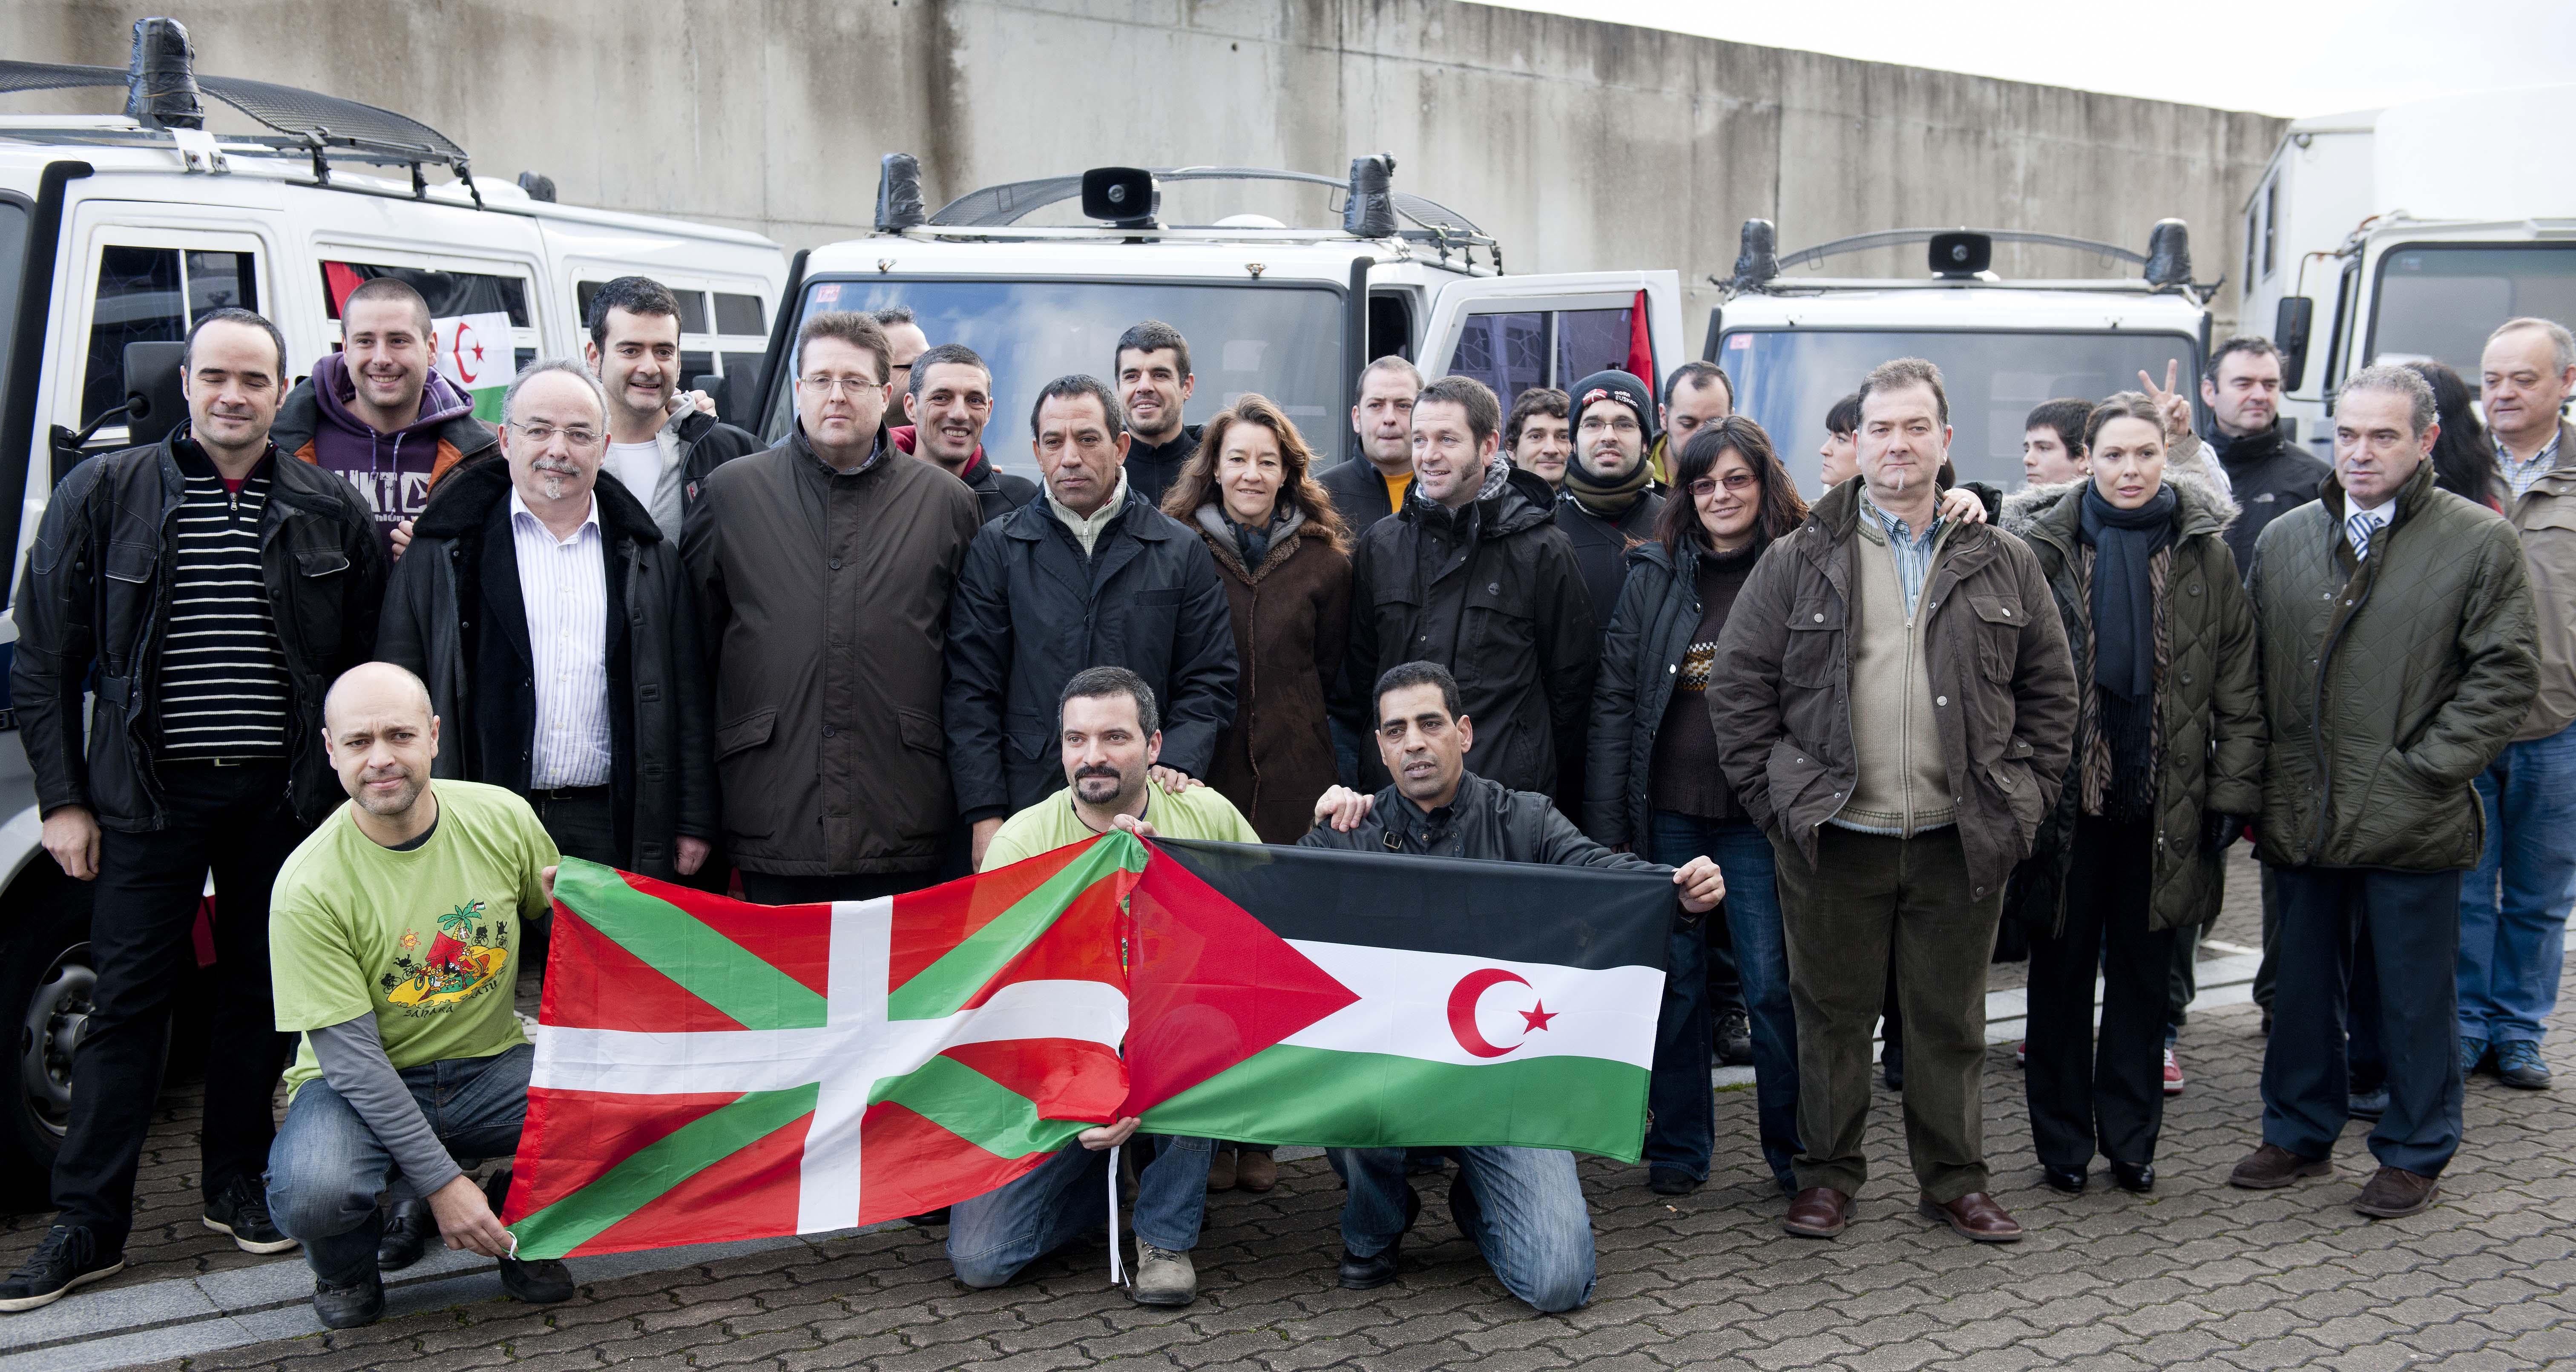 2012_02_16_interior_entrega_material_pueblo_saharaui_06.jpg